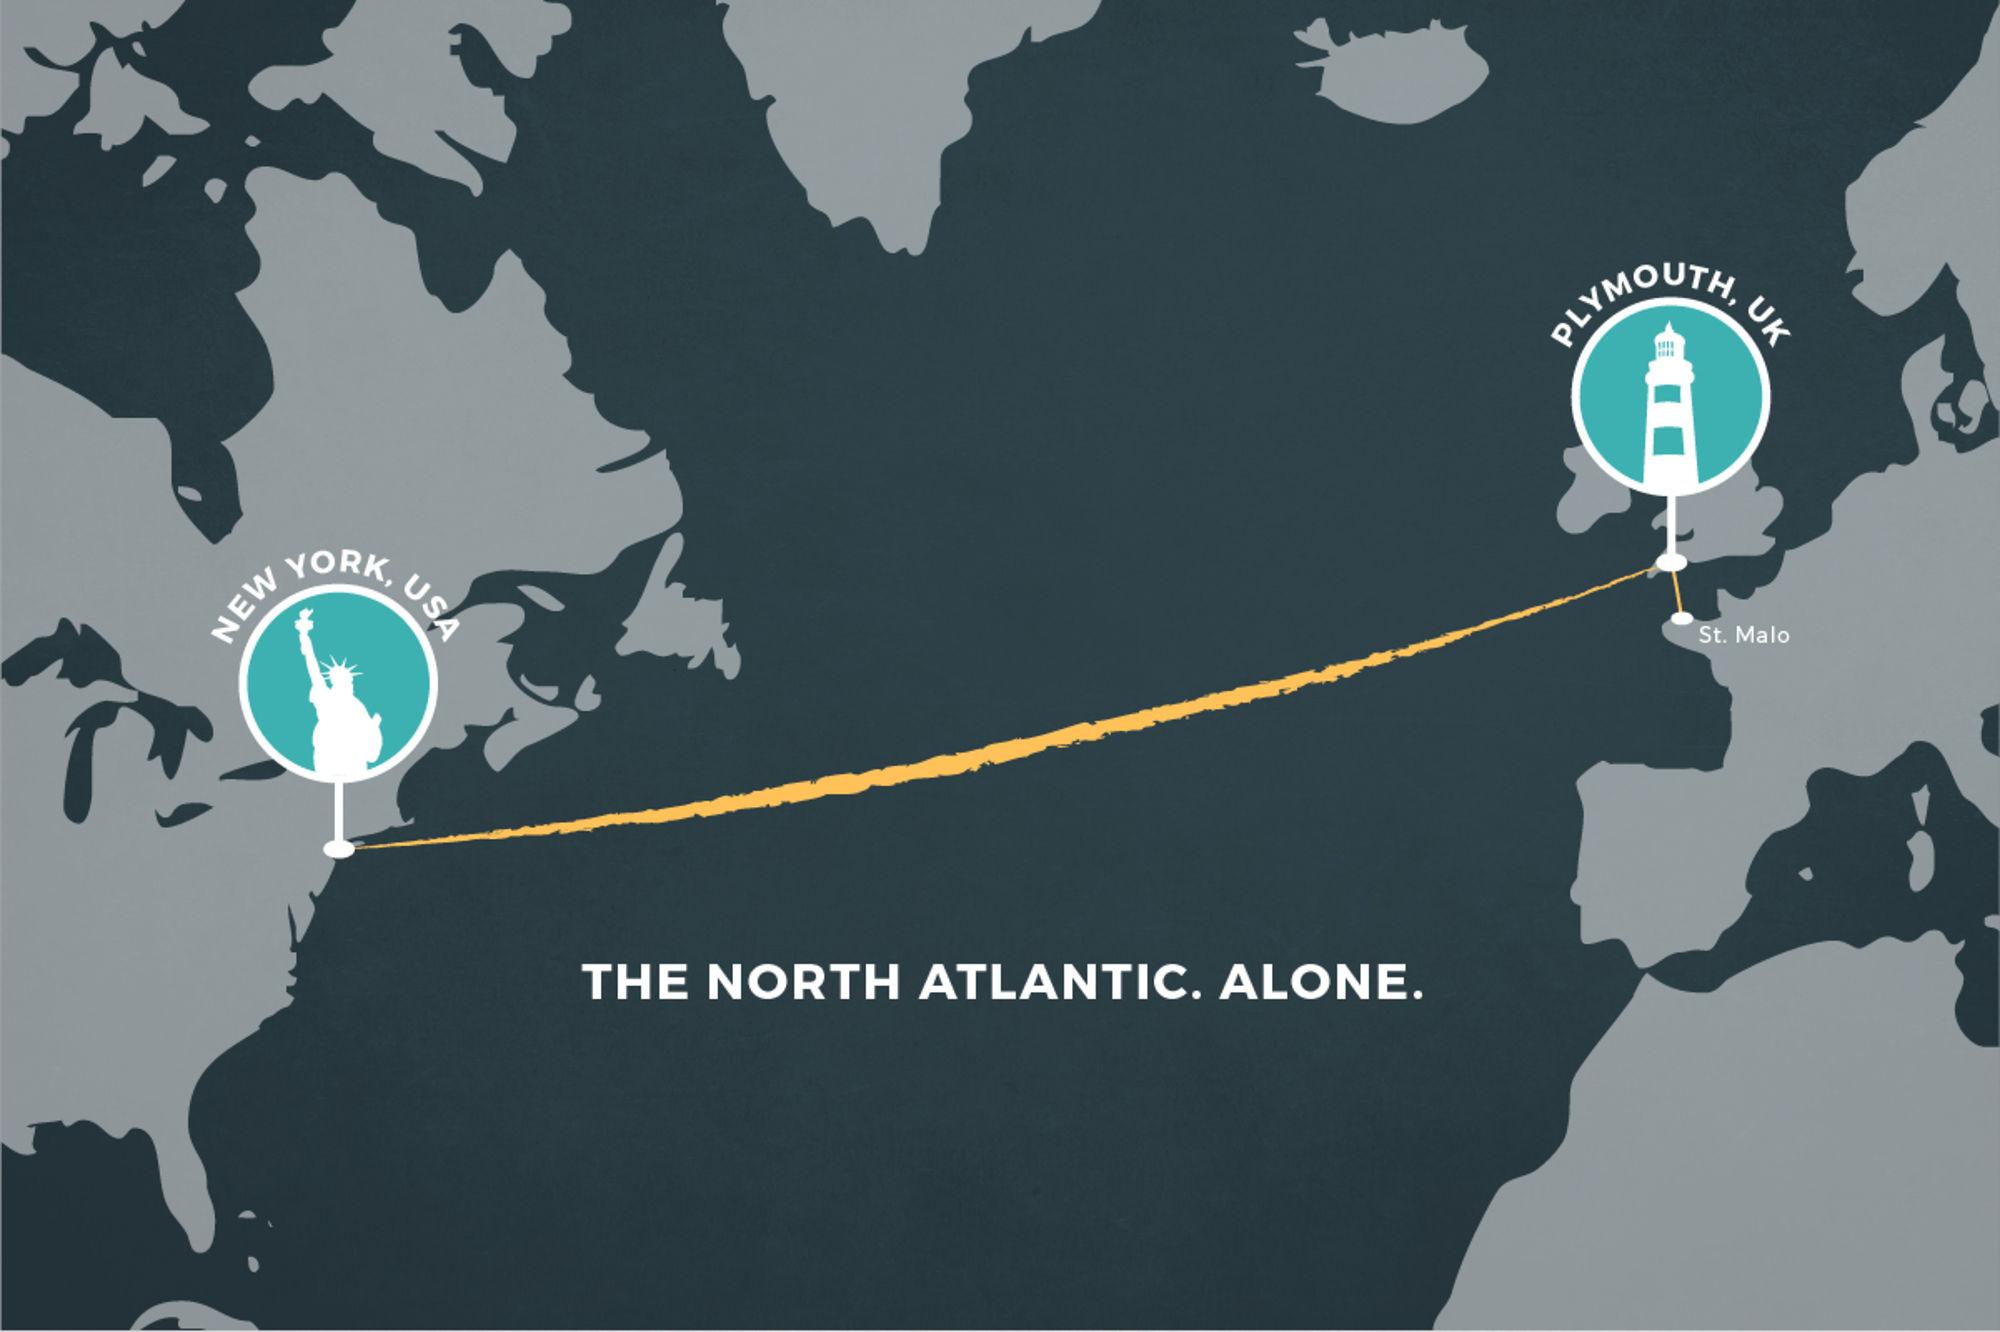 Las 3000 millas de recorrido de La Transat